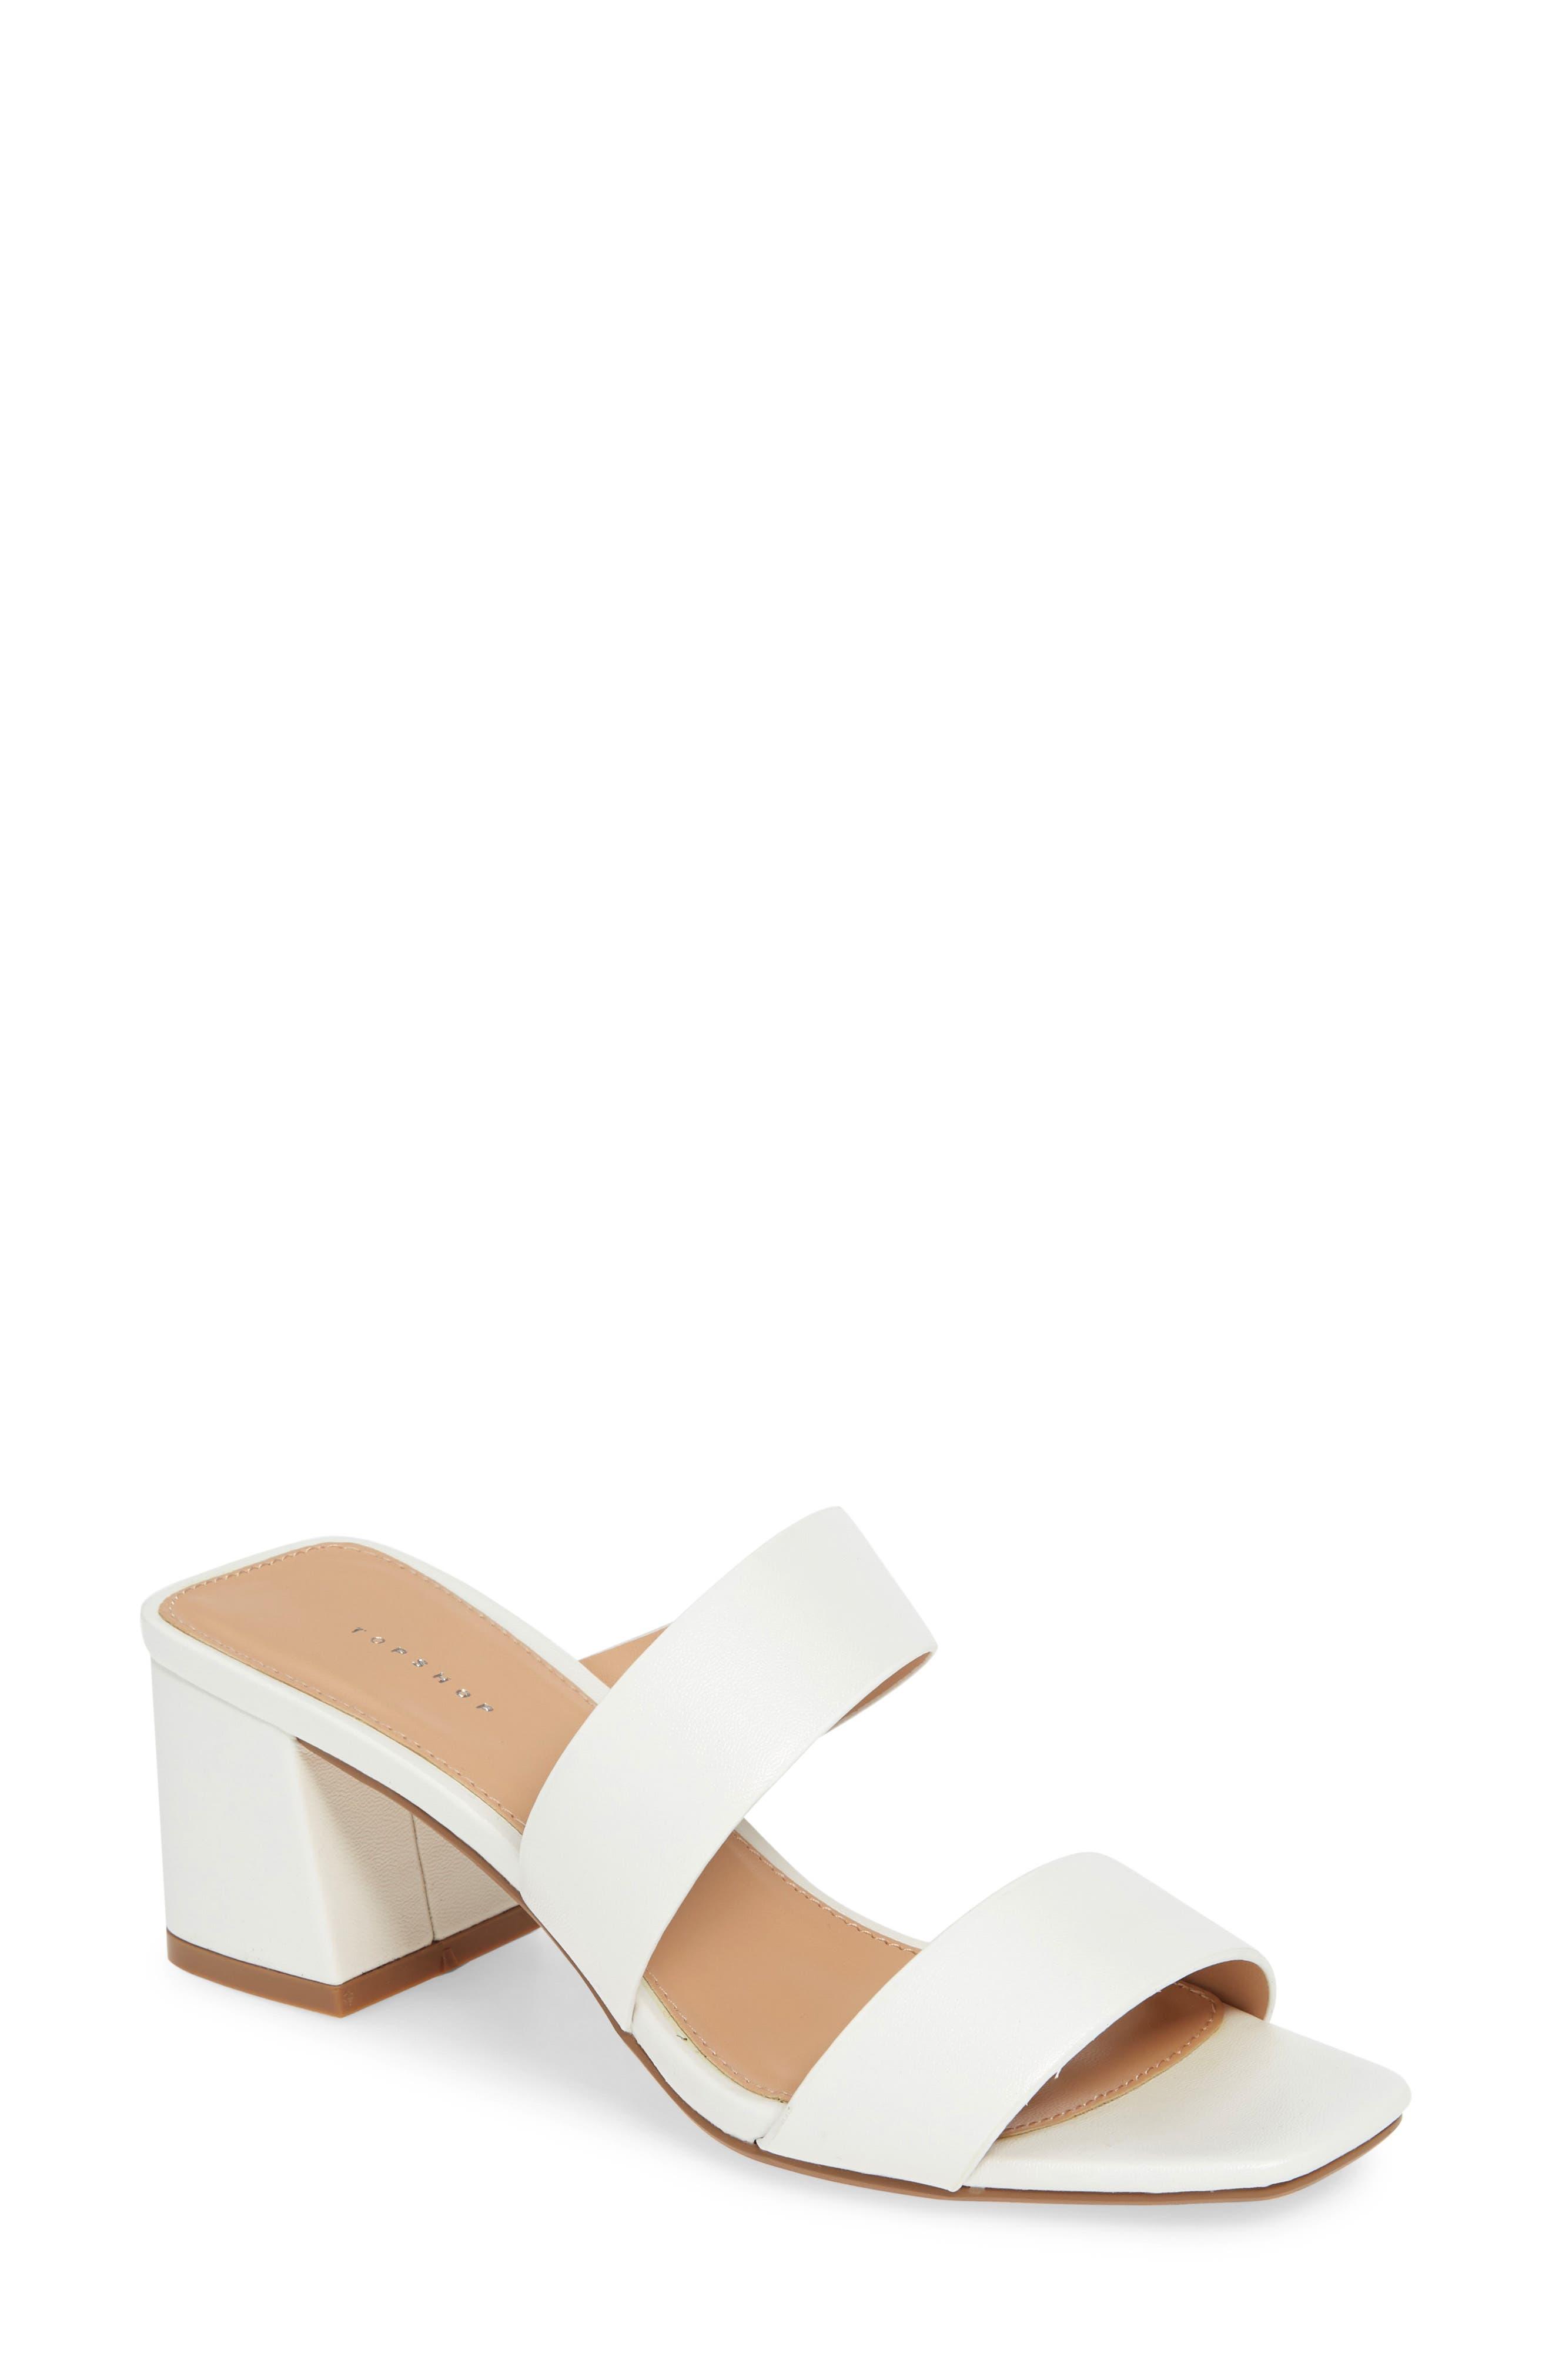 TOPSHOP, Darla Slide Sandal, Main thumbnail 1, color, WHITE